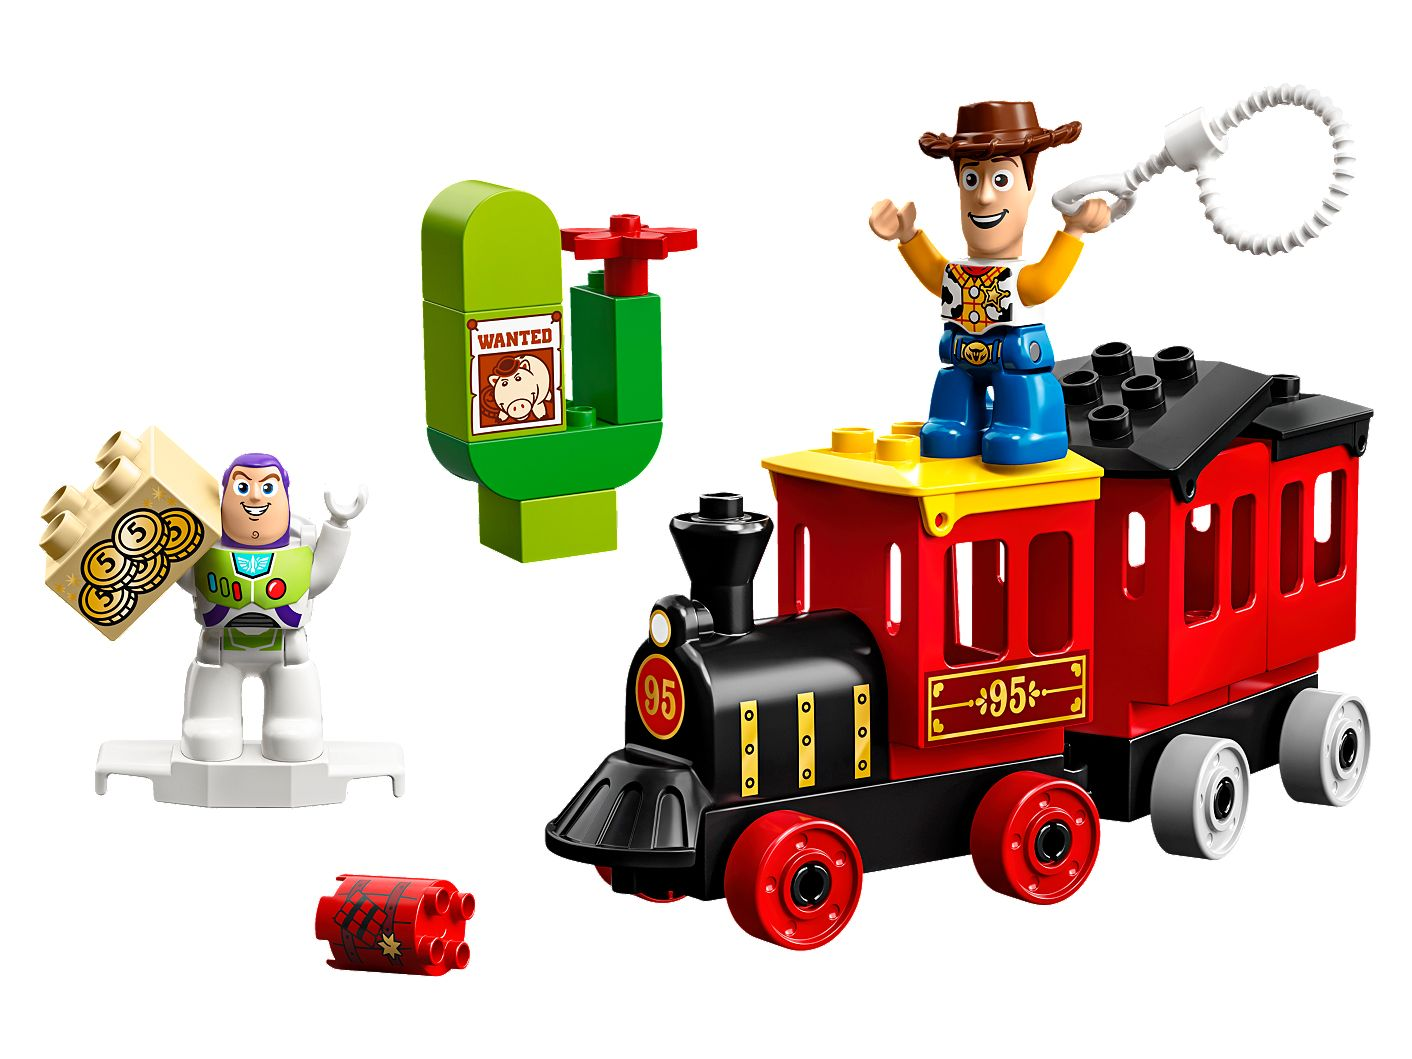 Toy Story Train - 10894 | DUPLO® | LEGO Shop